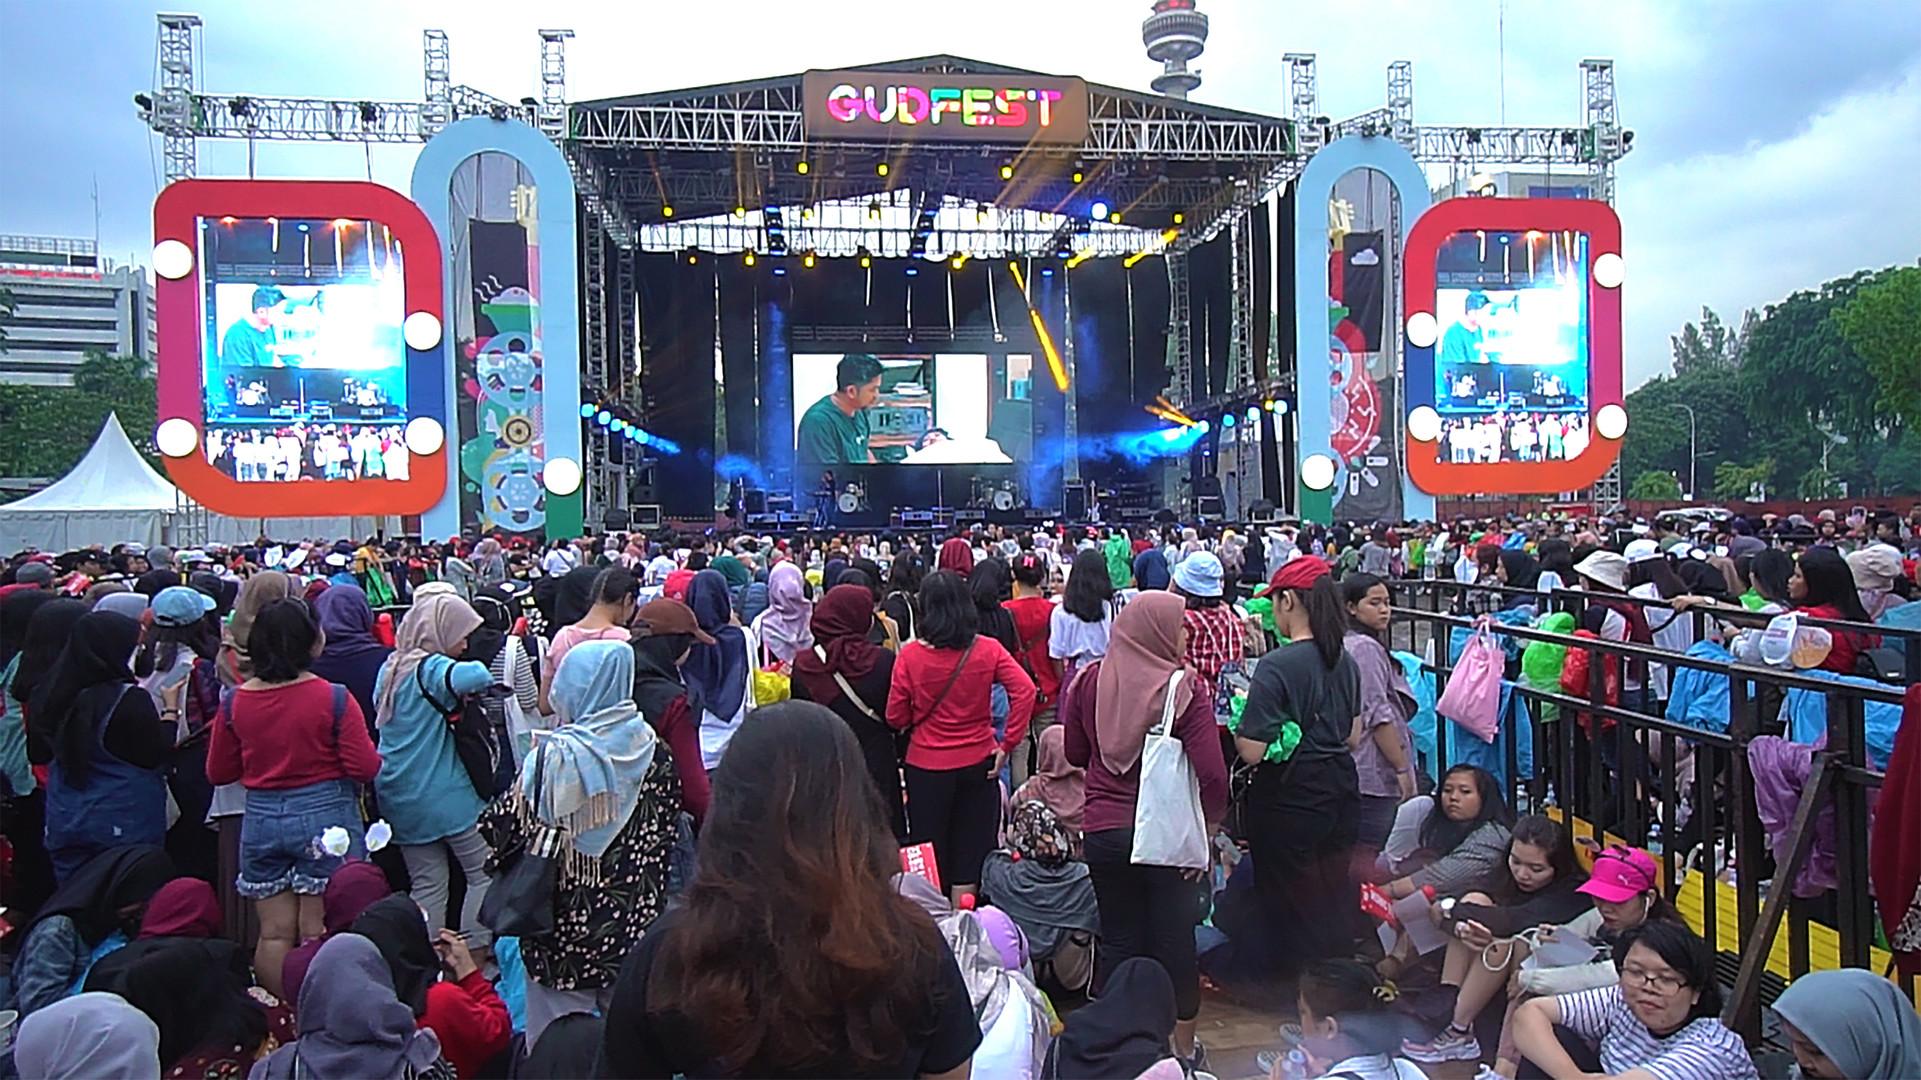 soundlive_promoter_music_indonesia_Gudfest_Stage_1.jpg